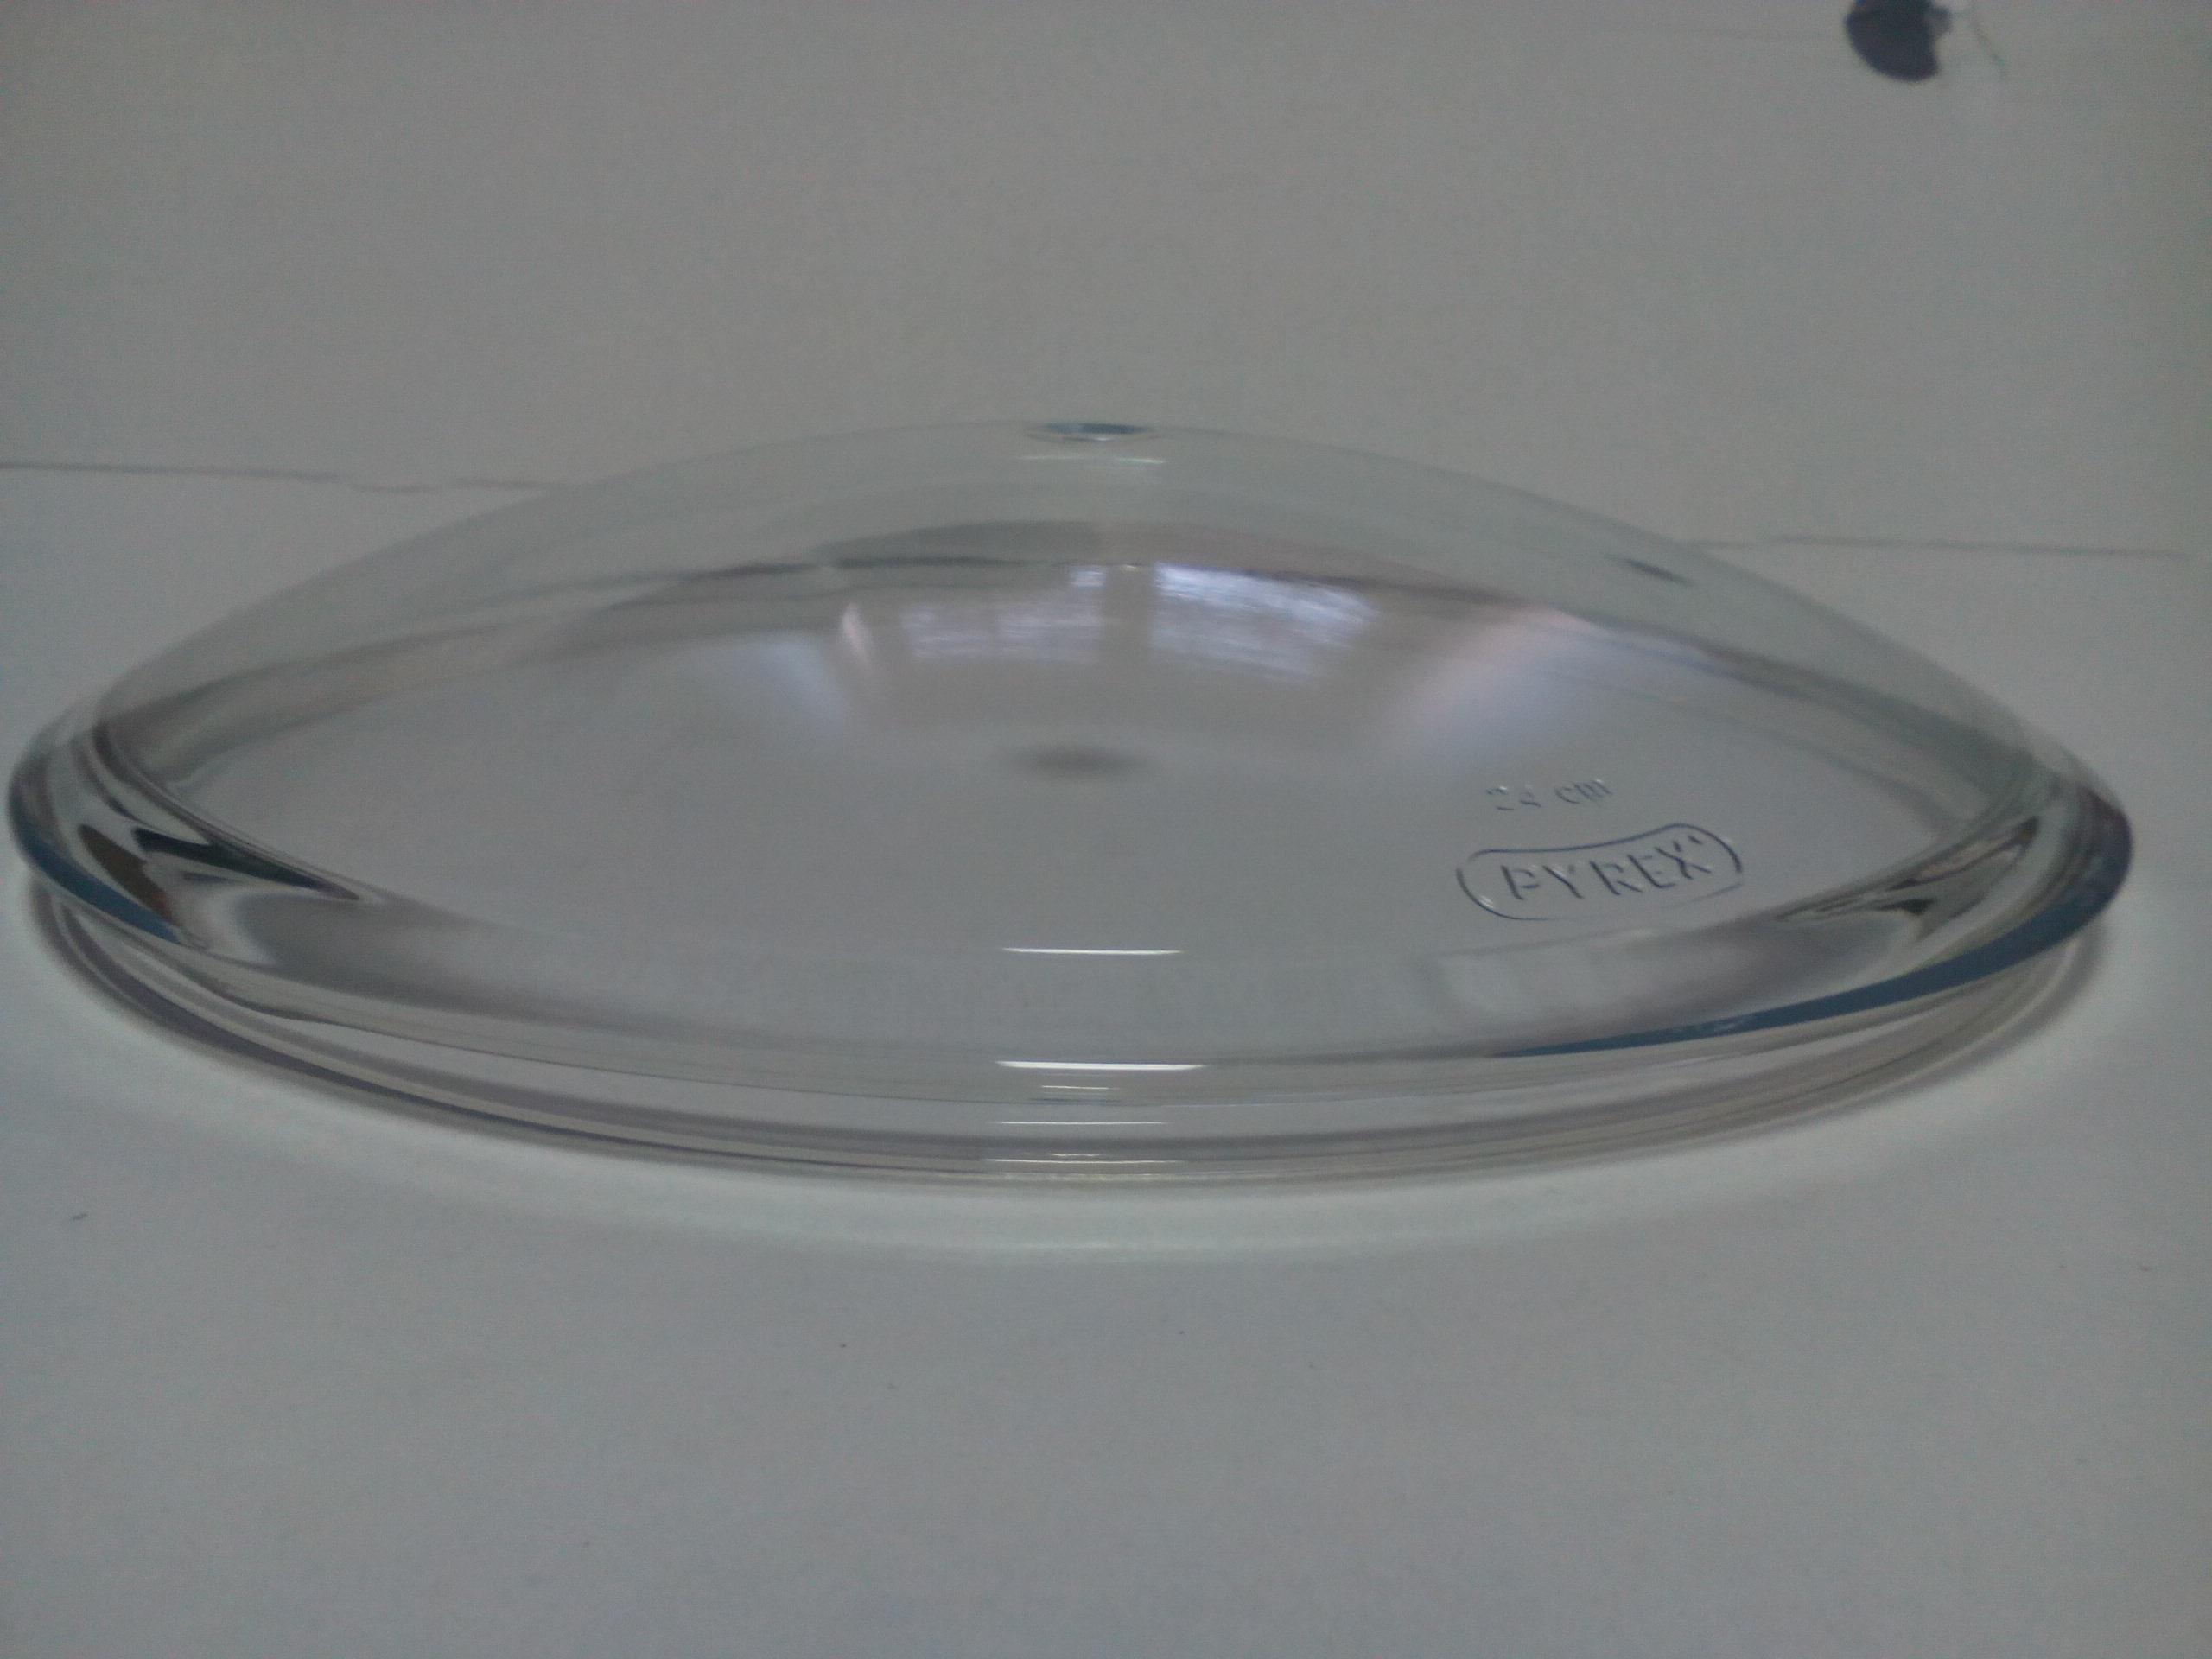 Poklice - 24 cm pyrex konus